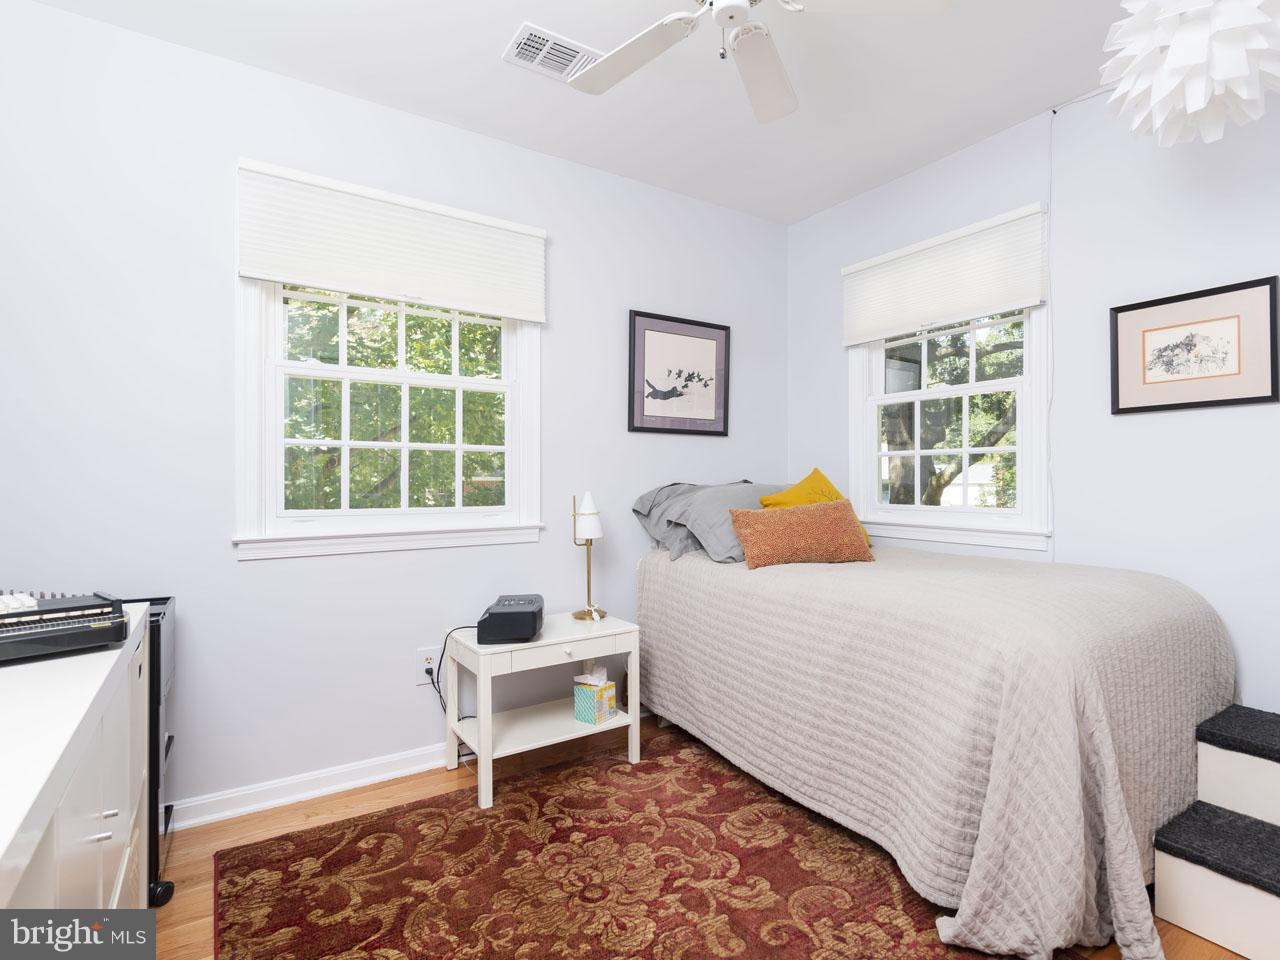 1006211278-300688039385-2021-07-22-07-39-40        Burke Delaware Real Estate For Sale   MLS# 1006211278  - Best of Northern Virginia